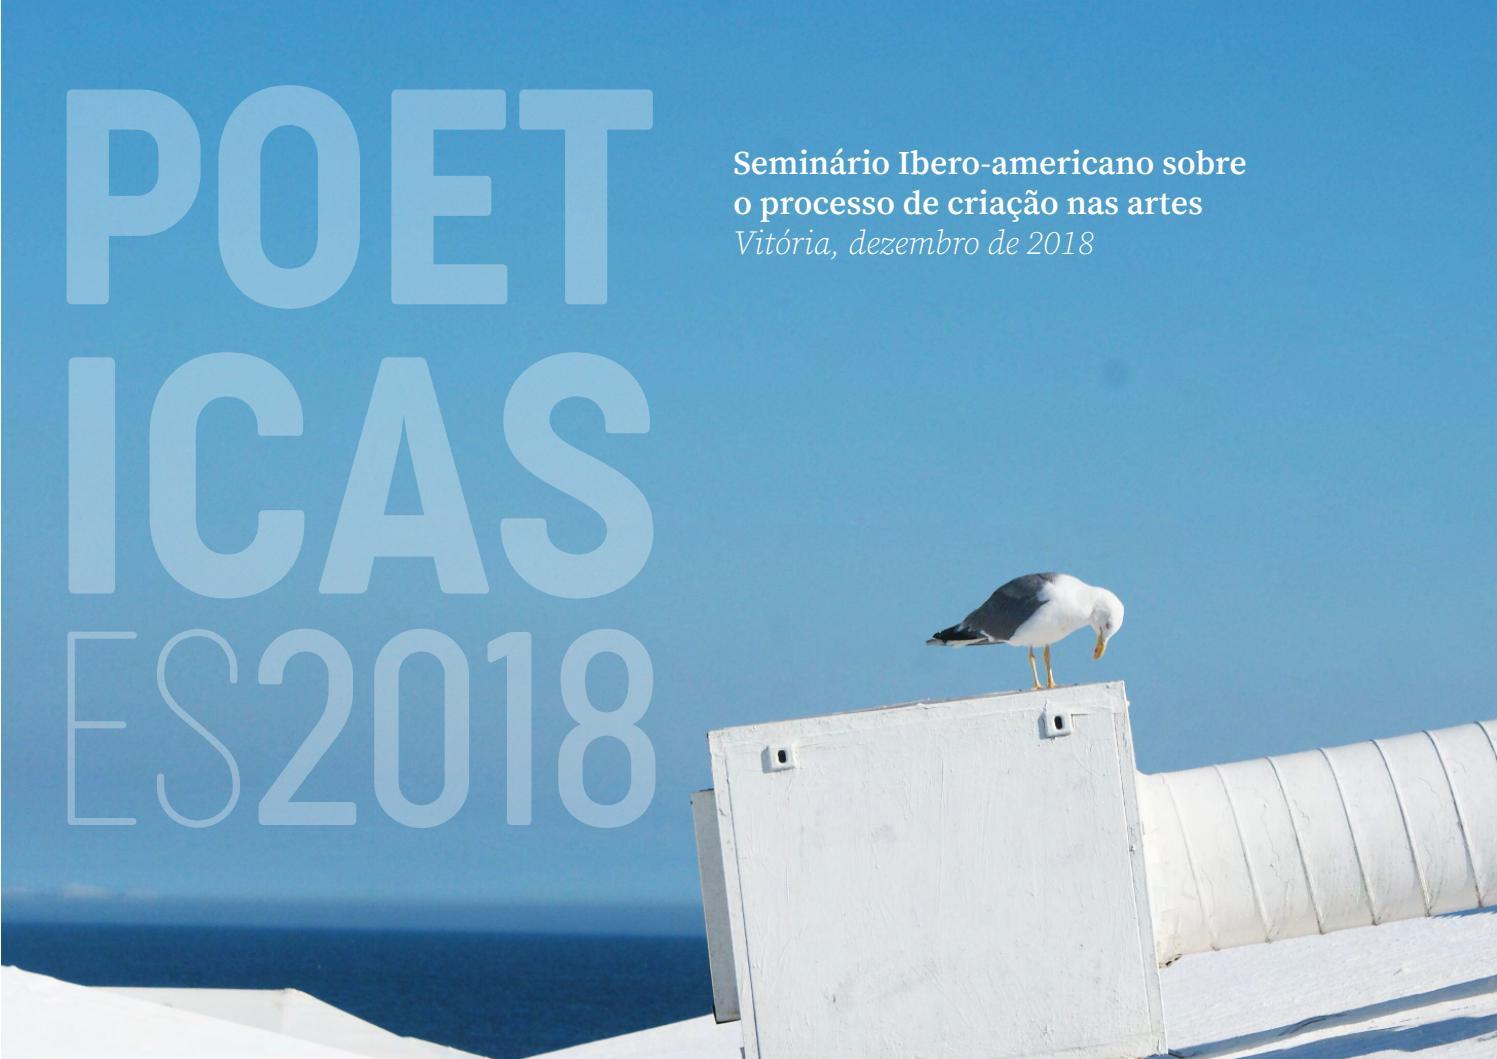 d08b886af4ba3 POETICAS, ES 2018 ANAIS - parte 1 by Jose Cirillo - issuu